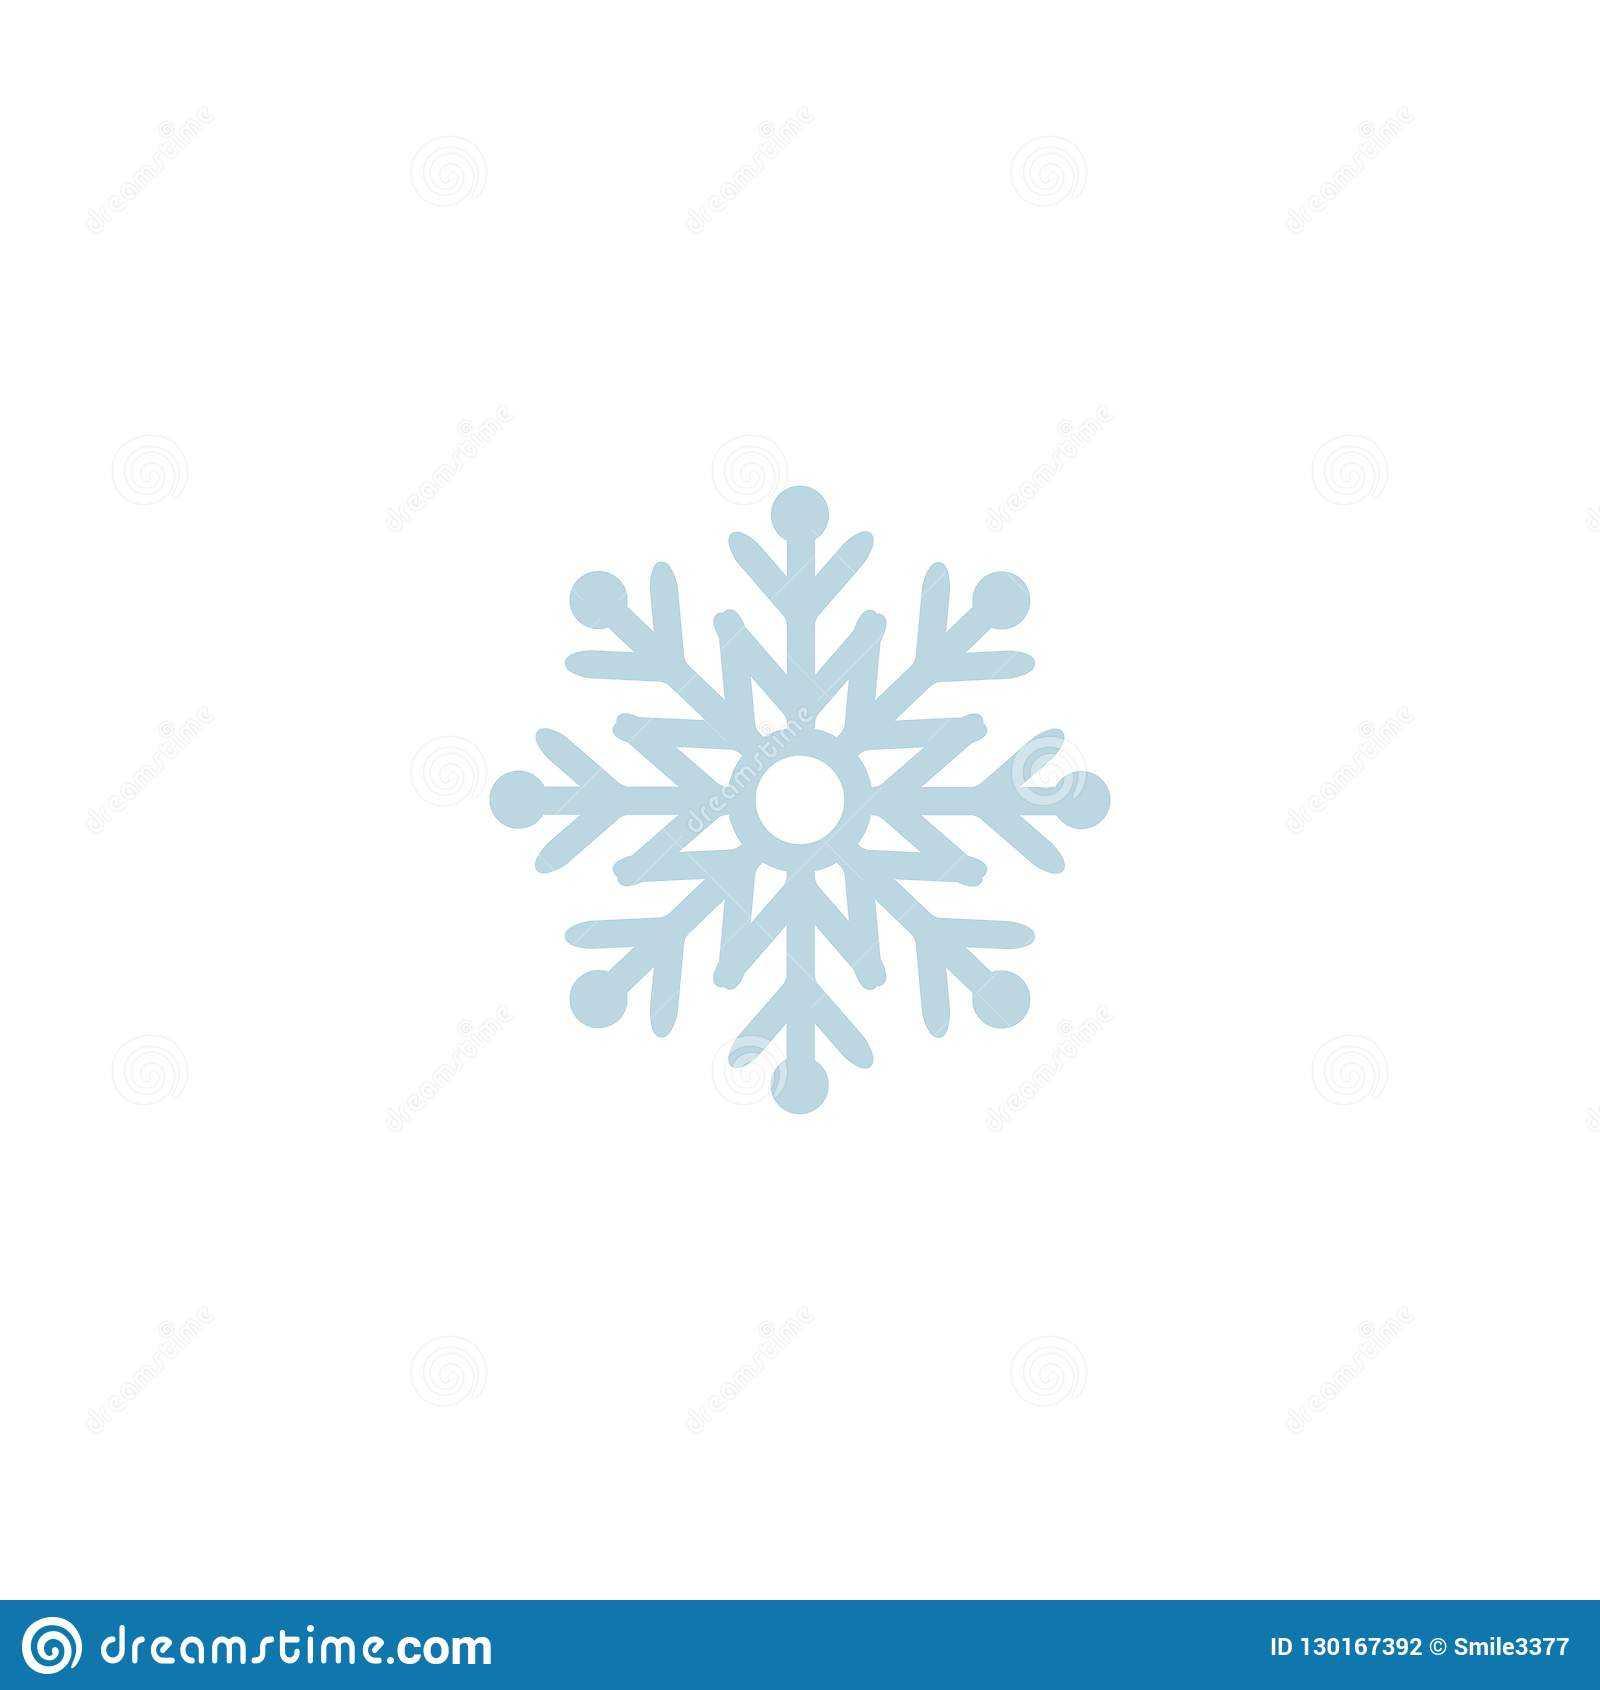 Snowflake Icon. Template Christmas Snowflake On Blank Intended For Blank Snowflake Template